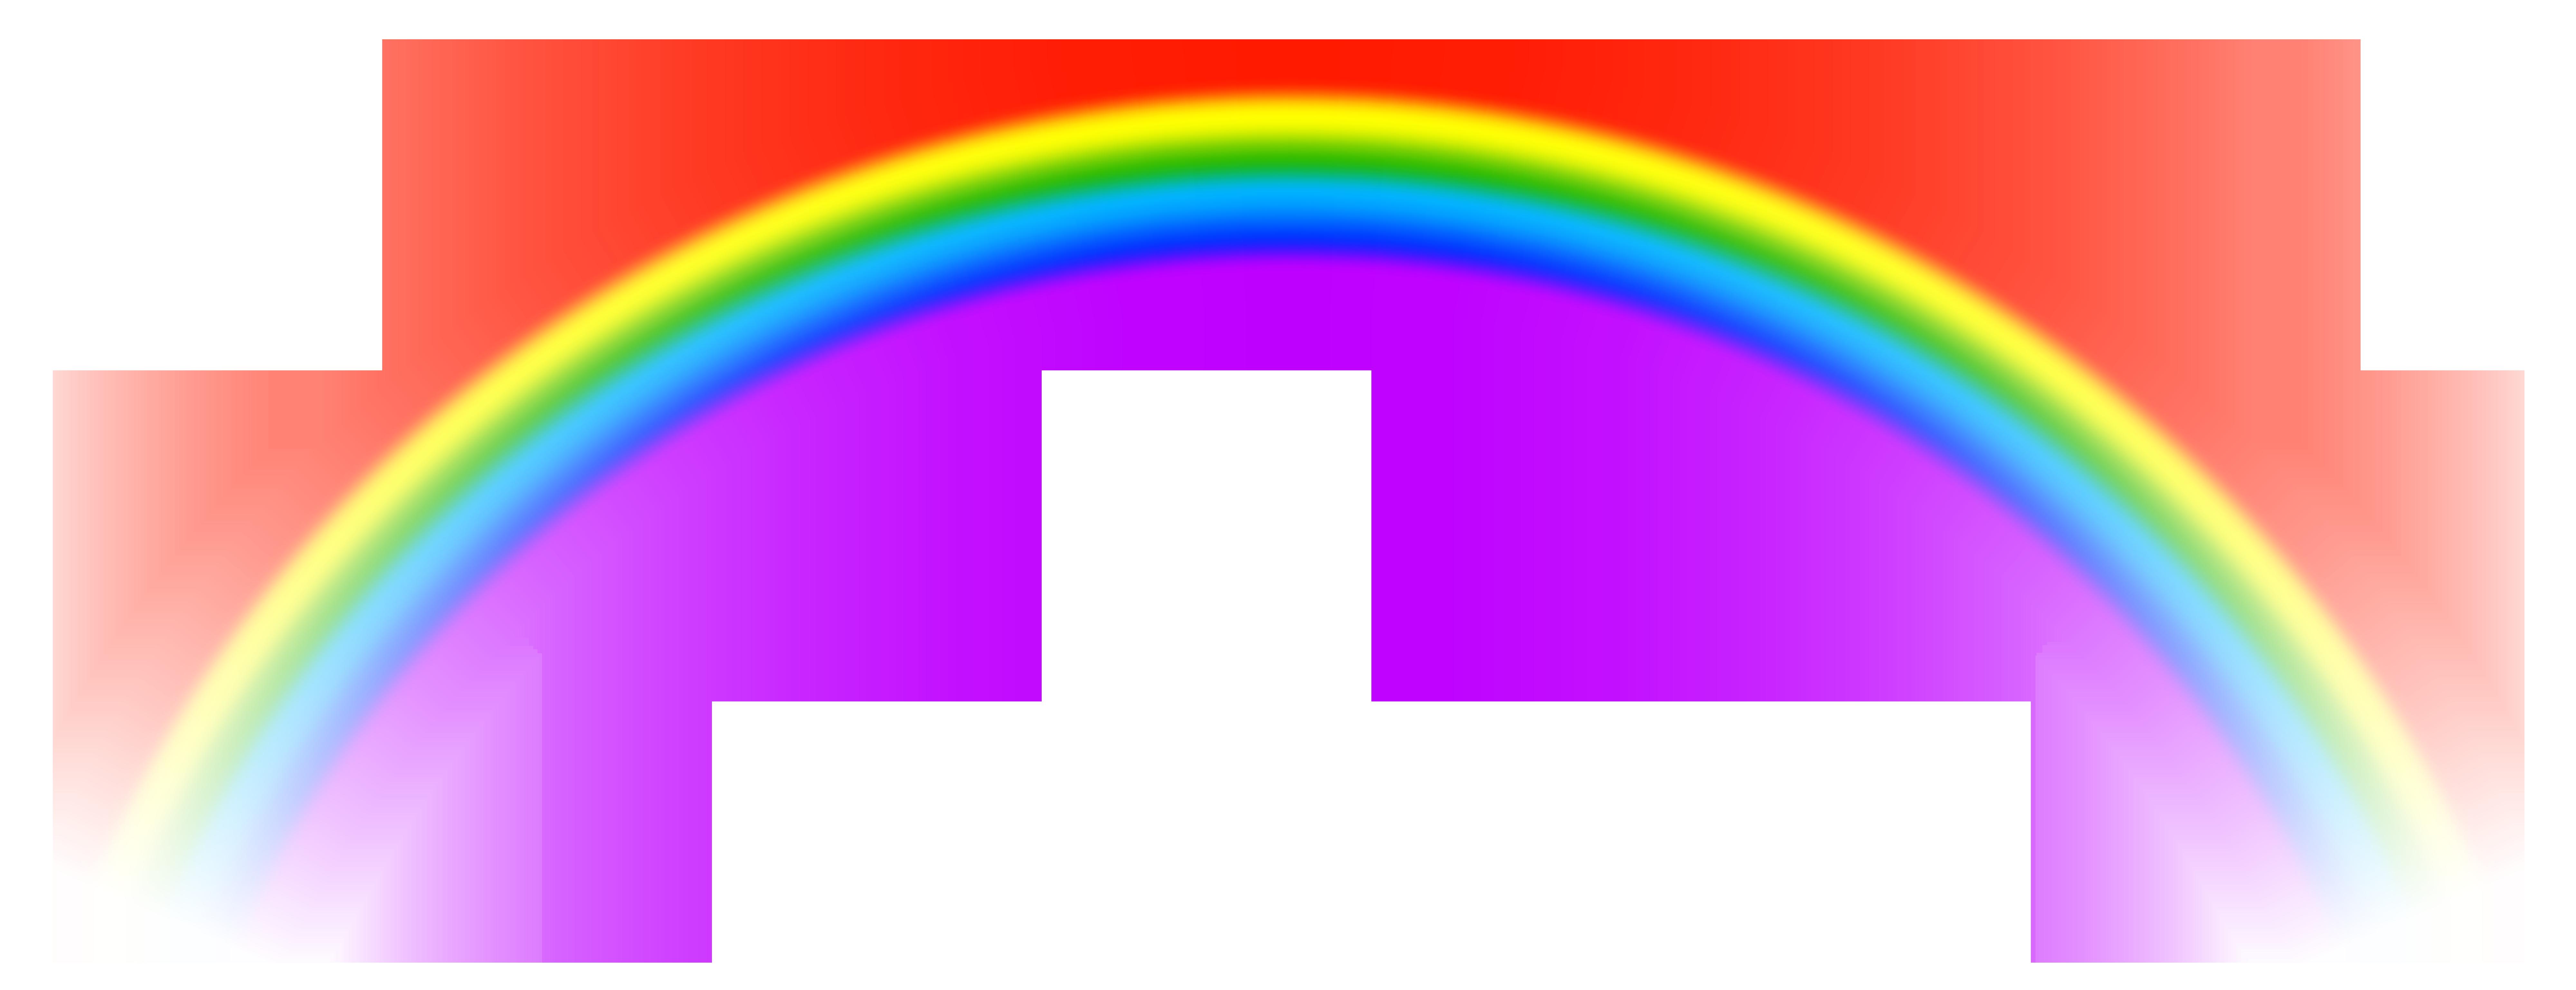 Positive clipart incorporation. Transparent rainbow png free